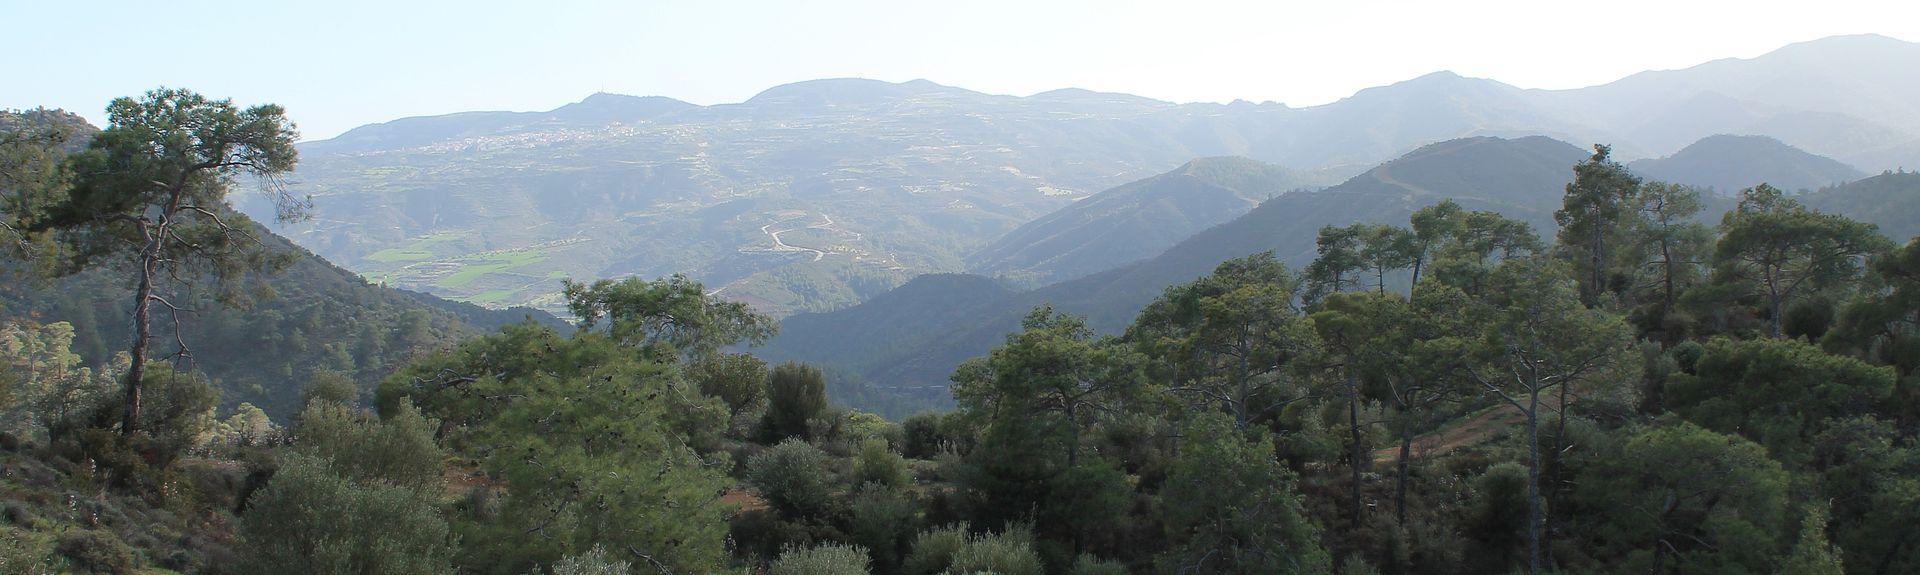 Pentakomo, Πεντάκωμο, Λεμεσός, Κύπρος